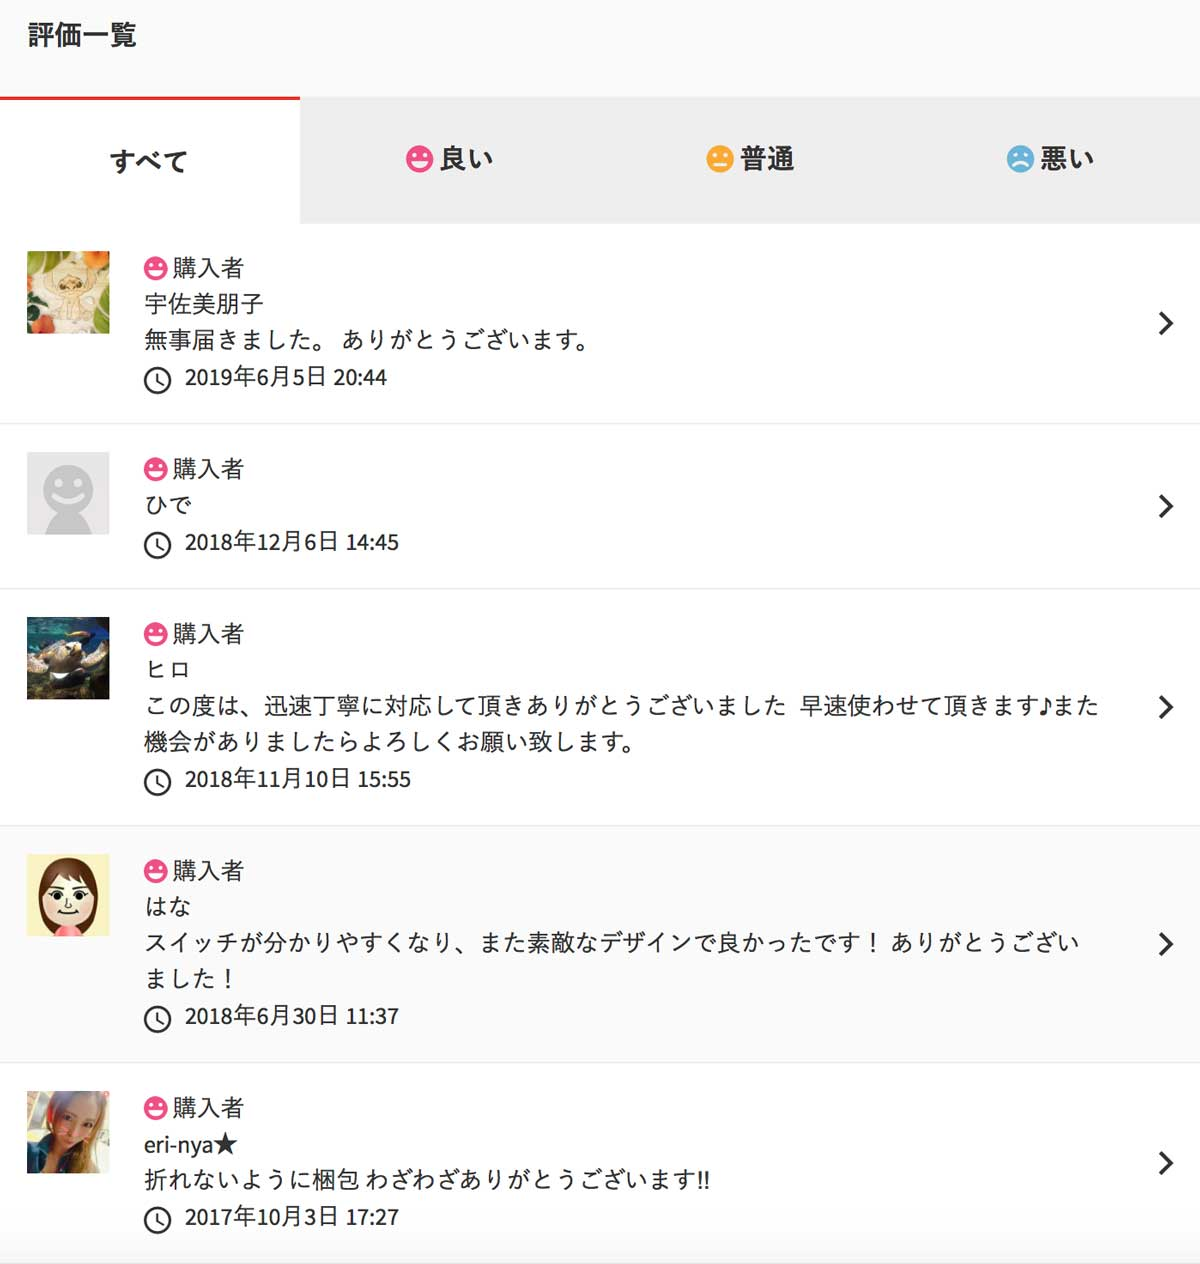 hitoiki ONLINESHOP(ひといきオンラインショップ)で実際に購入された方の評価や評判、レビュー、口コミ(クチコミ) review05